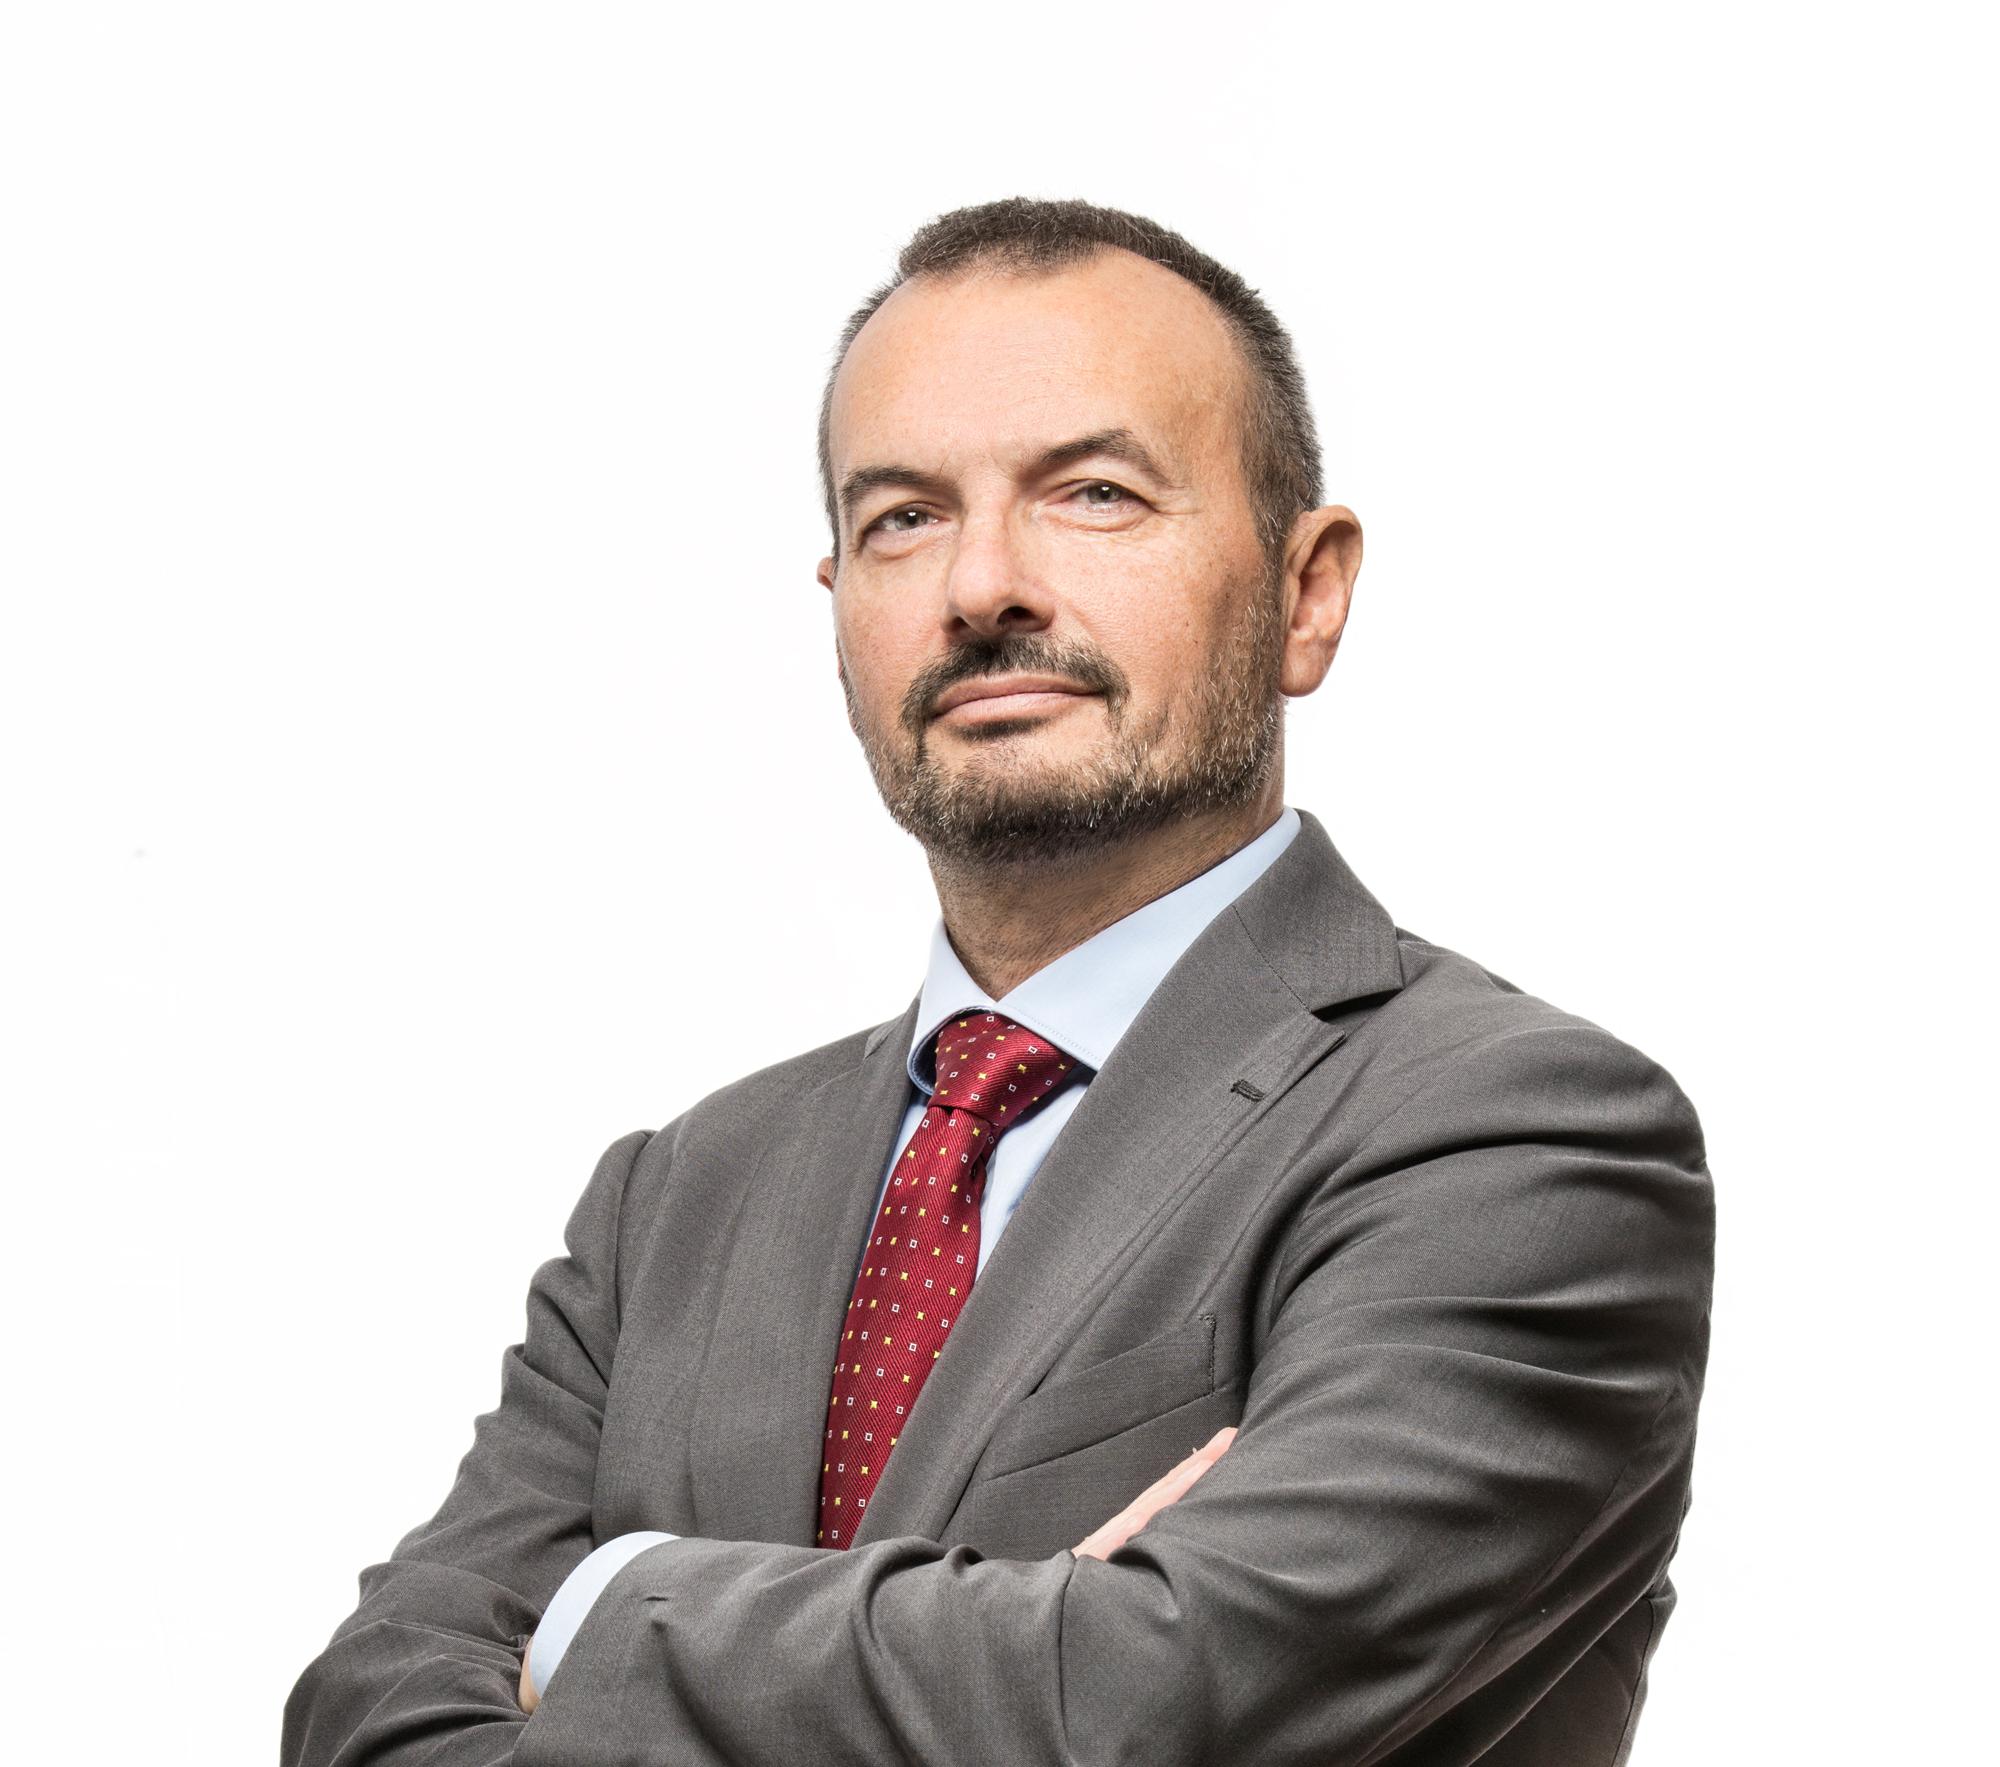 Carlo Pignoloni – CEO & Country Manager Enel Romania